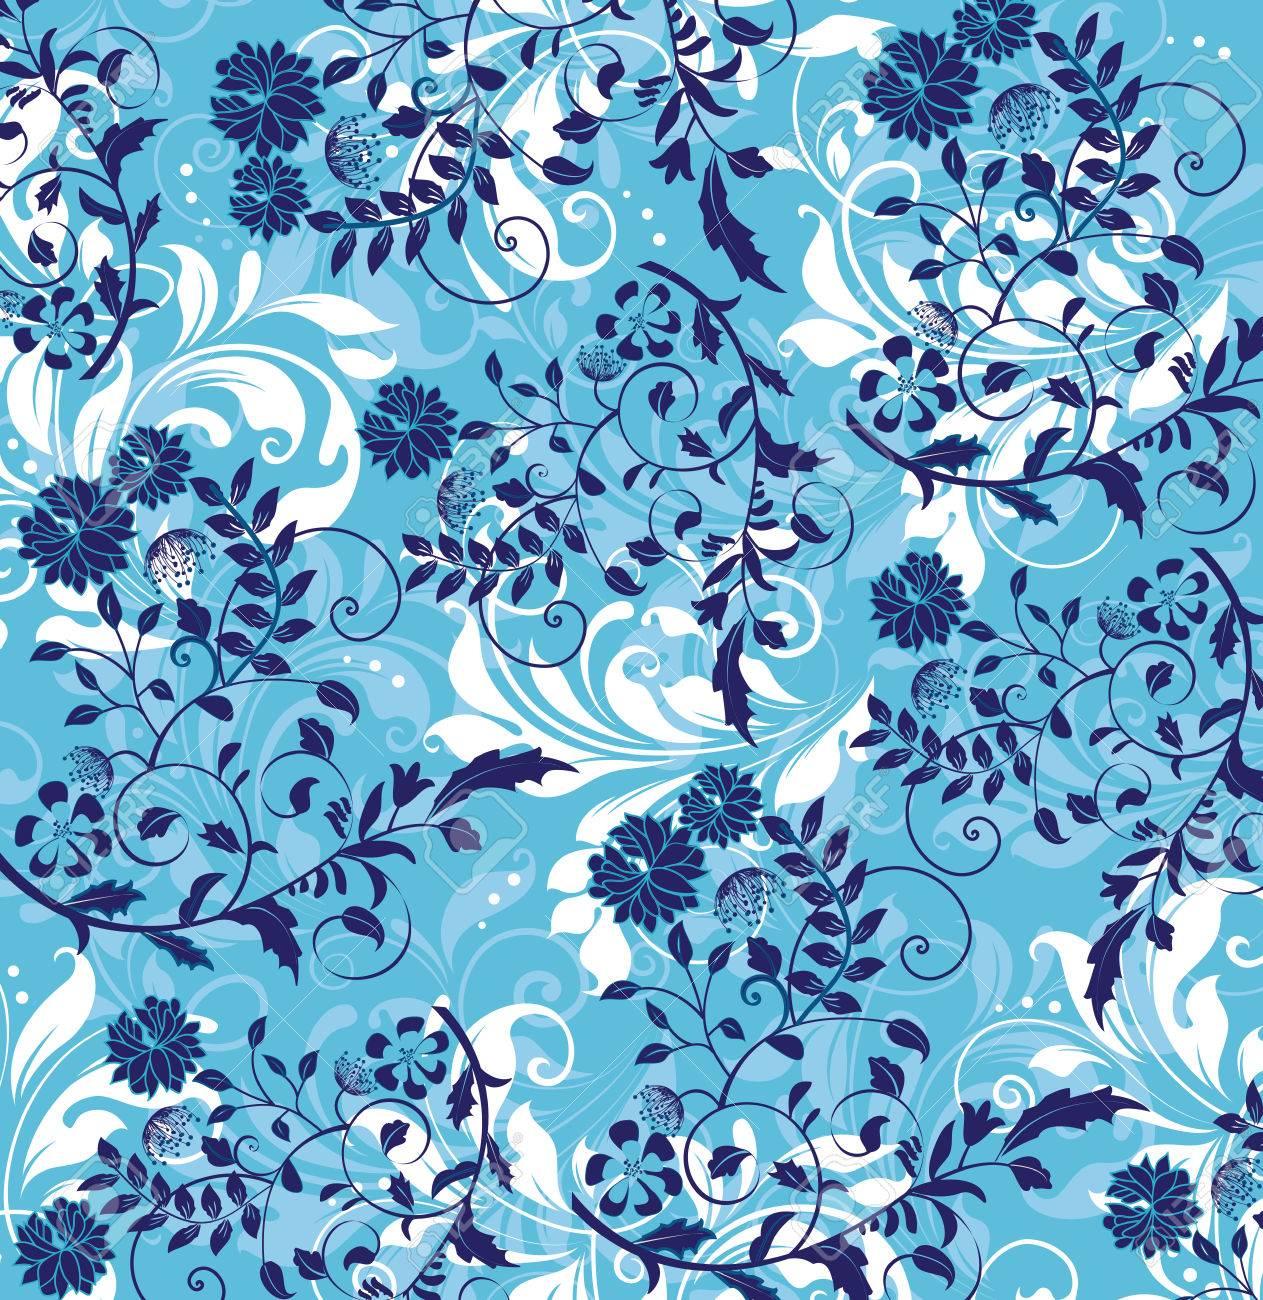 Vintage background with ornate elegant abstract floral design vector vintage background with ornate elegant abstract floral design midnight blue and white flowers on light blue vector illustration izmirmasajfo